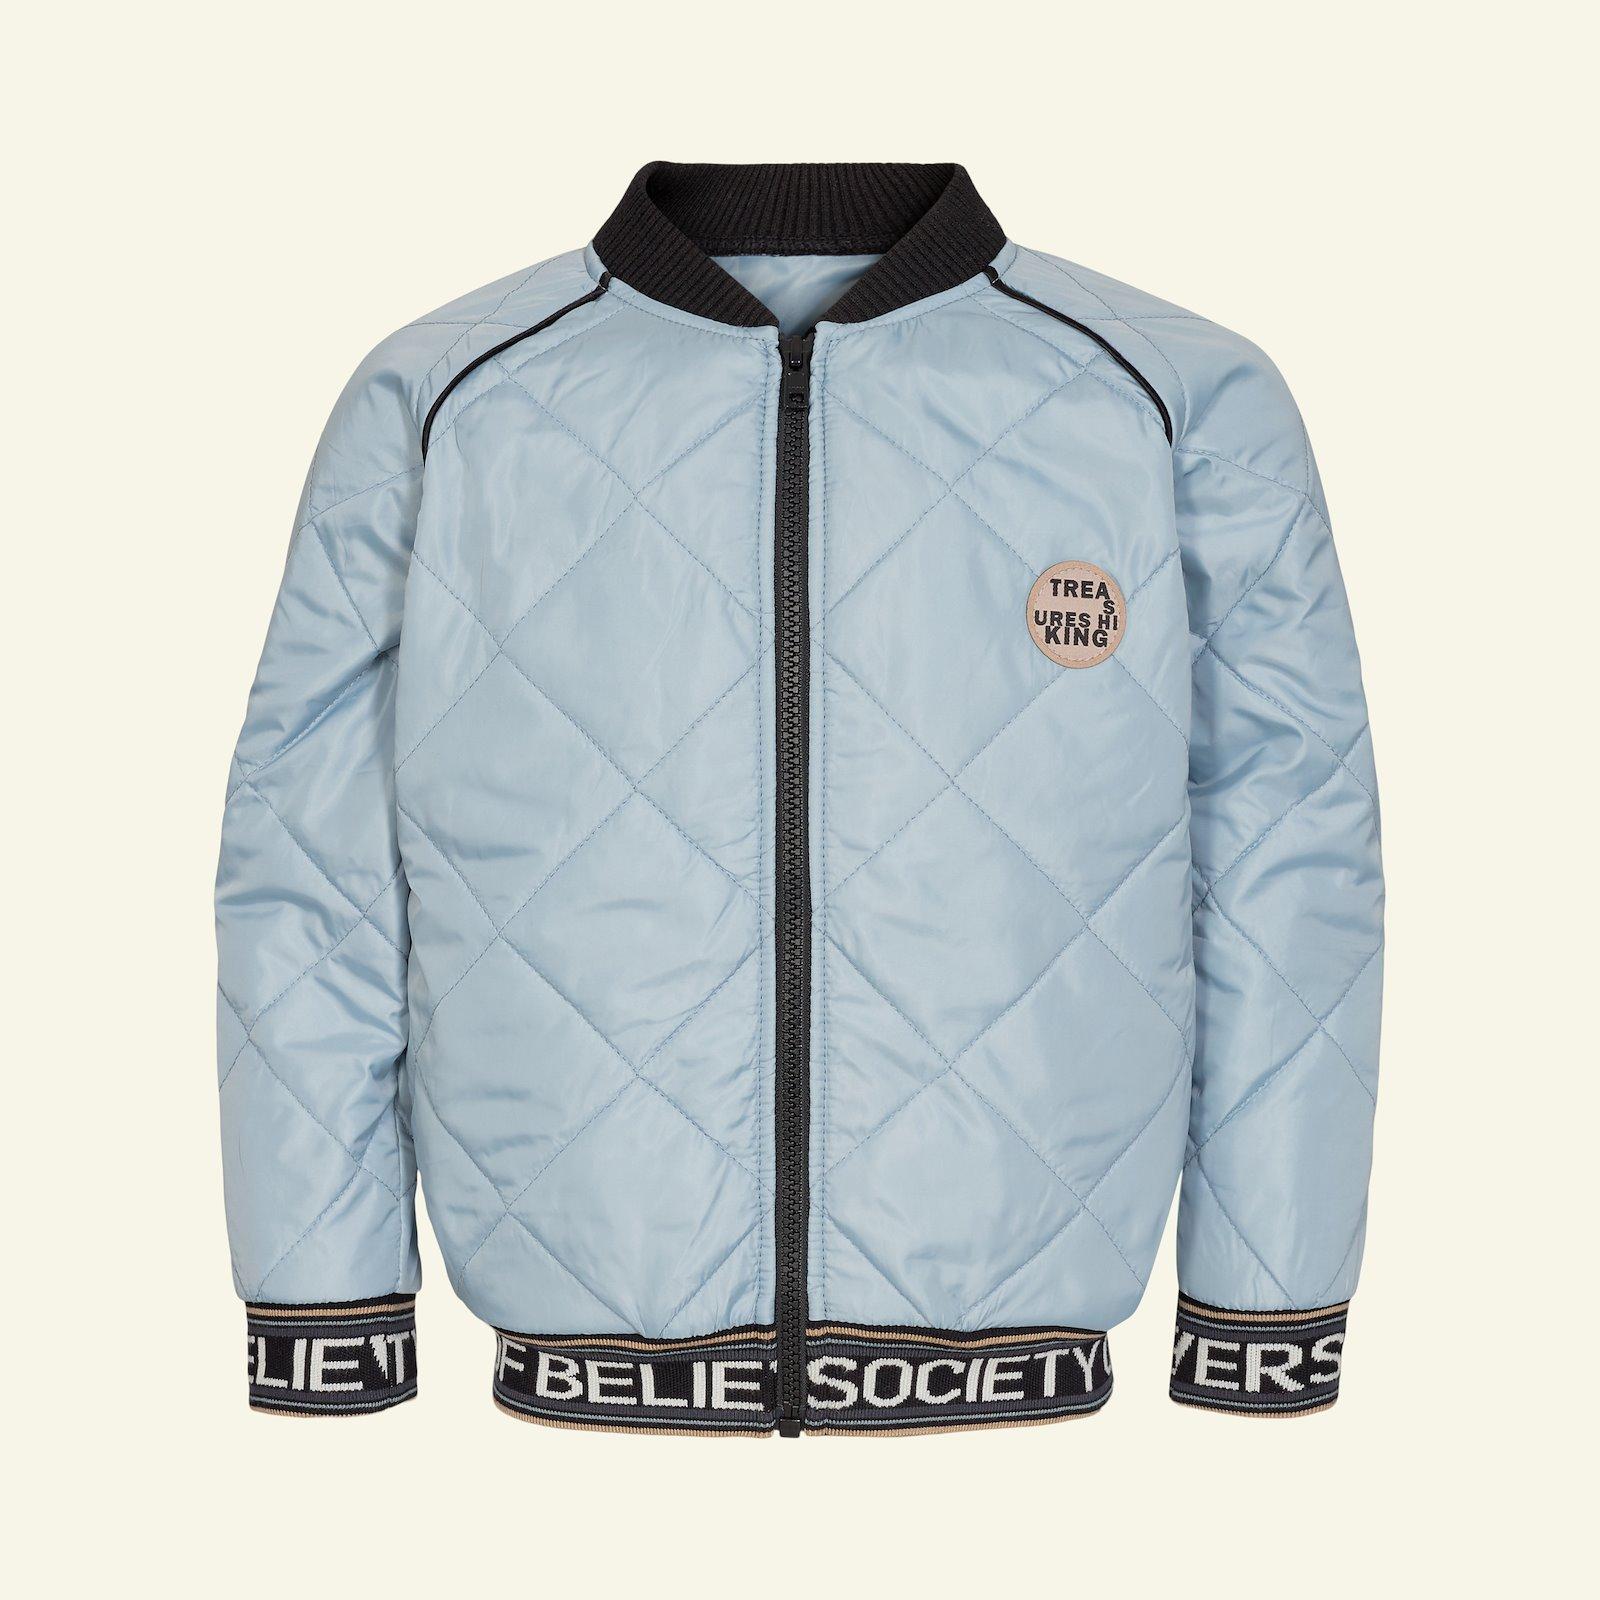 Bomber jacket, 134/9y p64017_920225_3509089_72043_26519_sskit